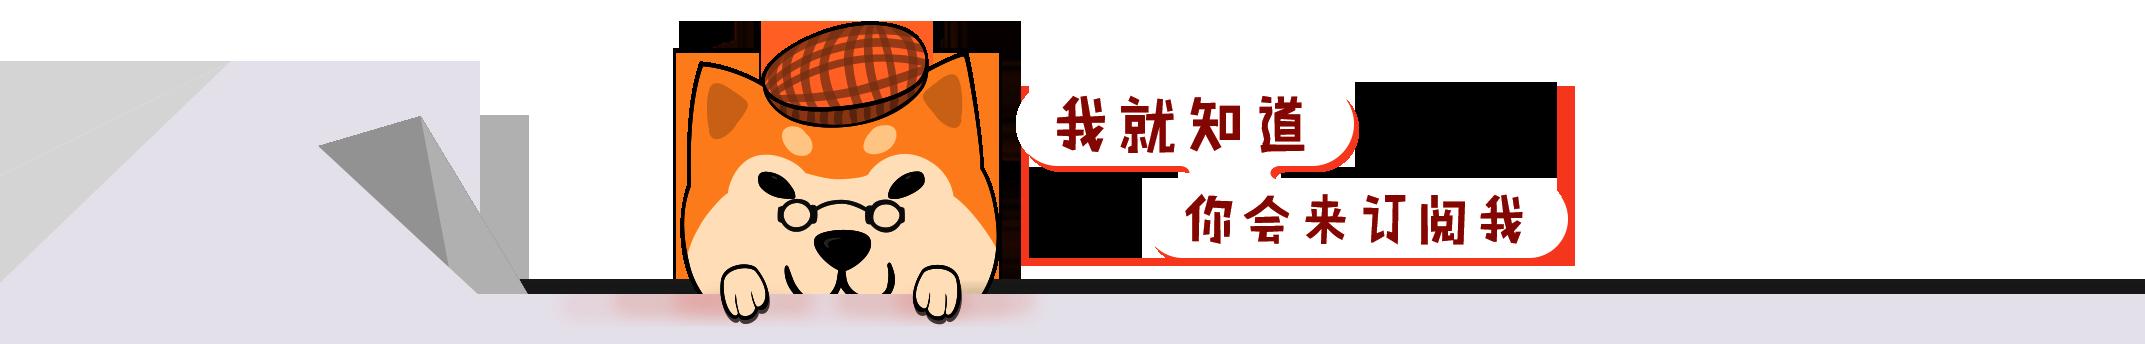 锋潮评测室 banner